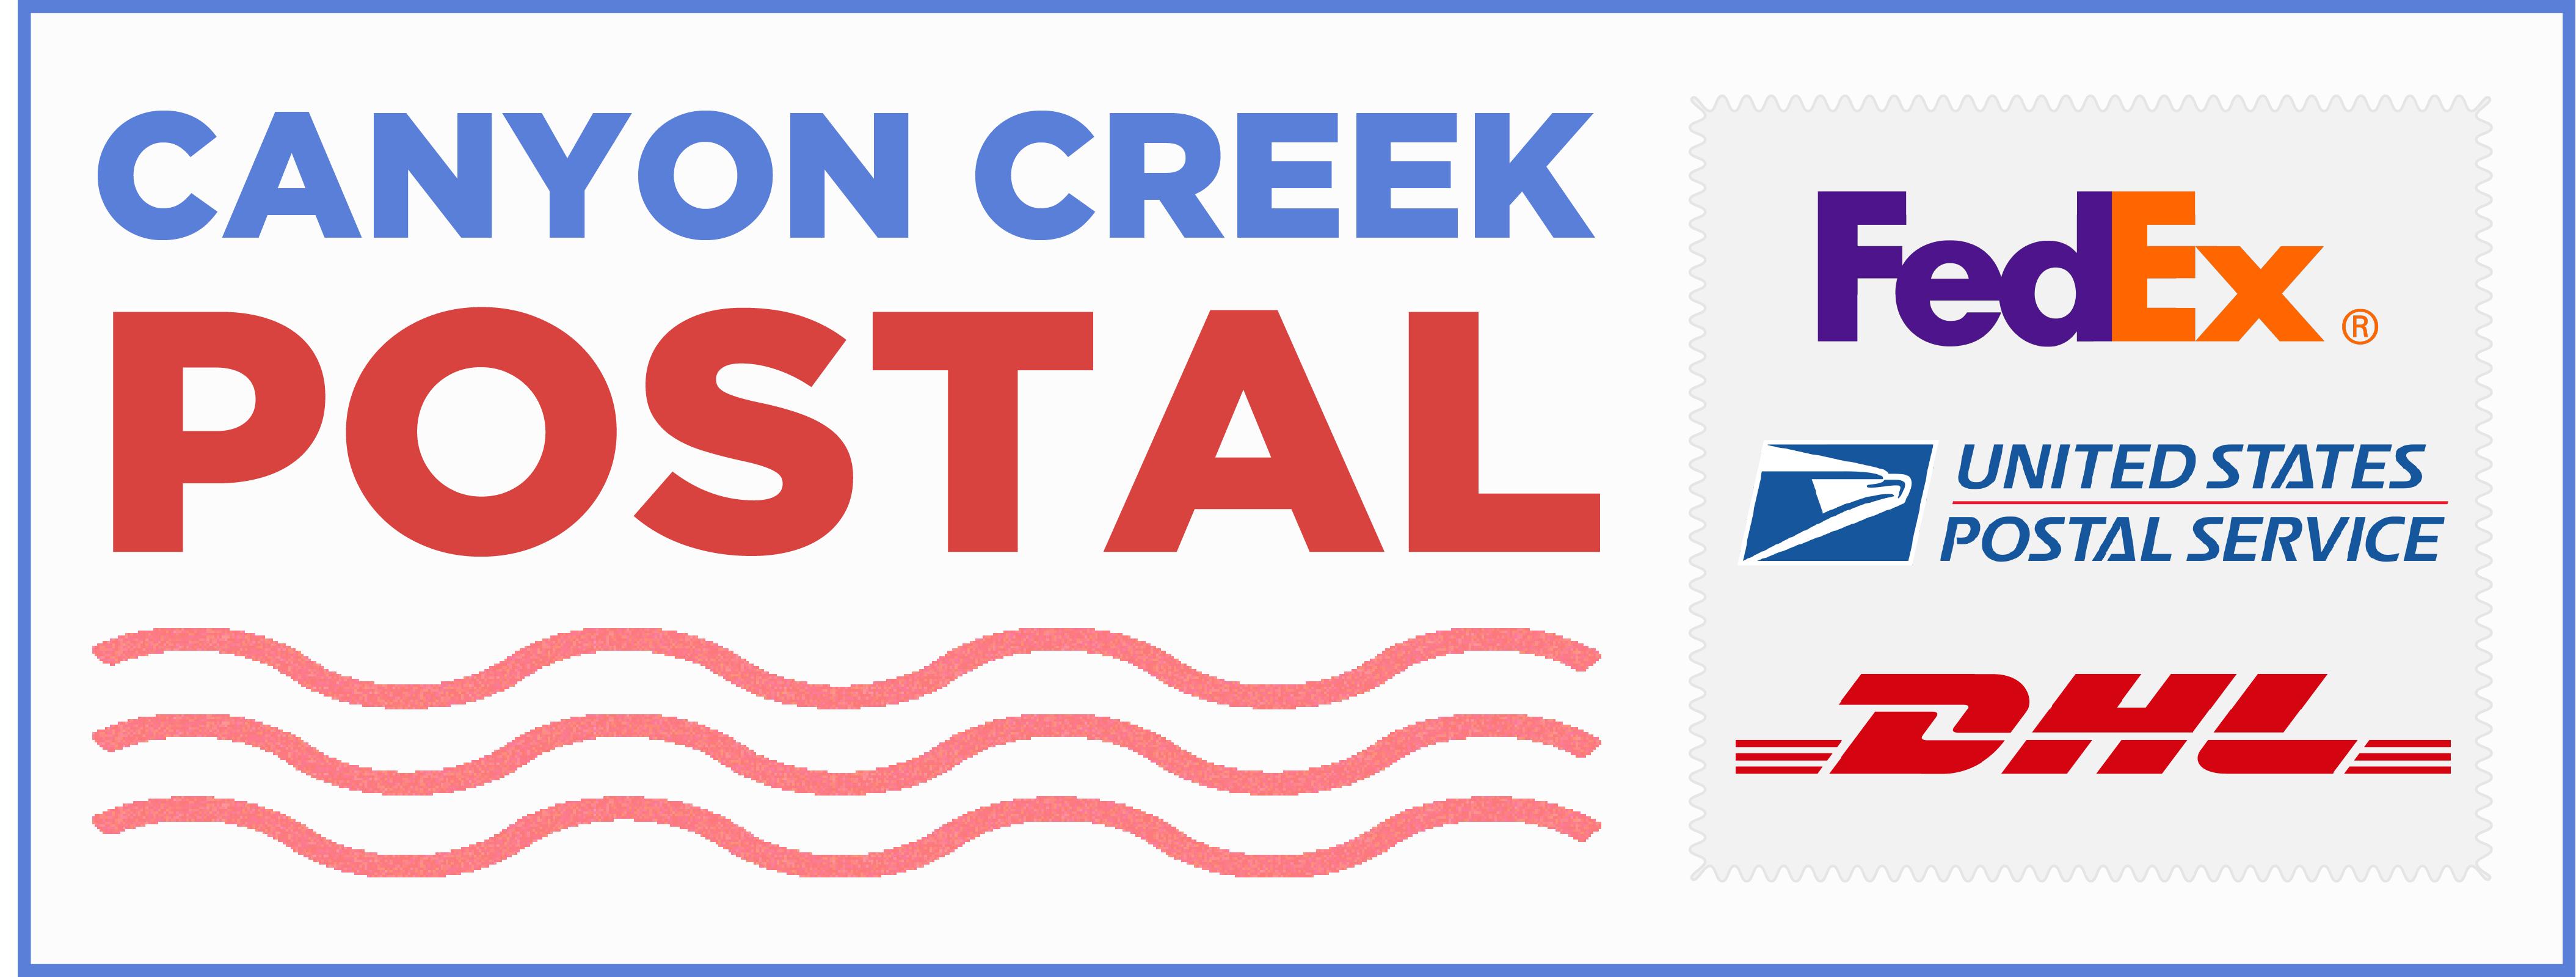 Shipping richardson tx canyon creek postal home about services buycottarizona